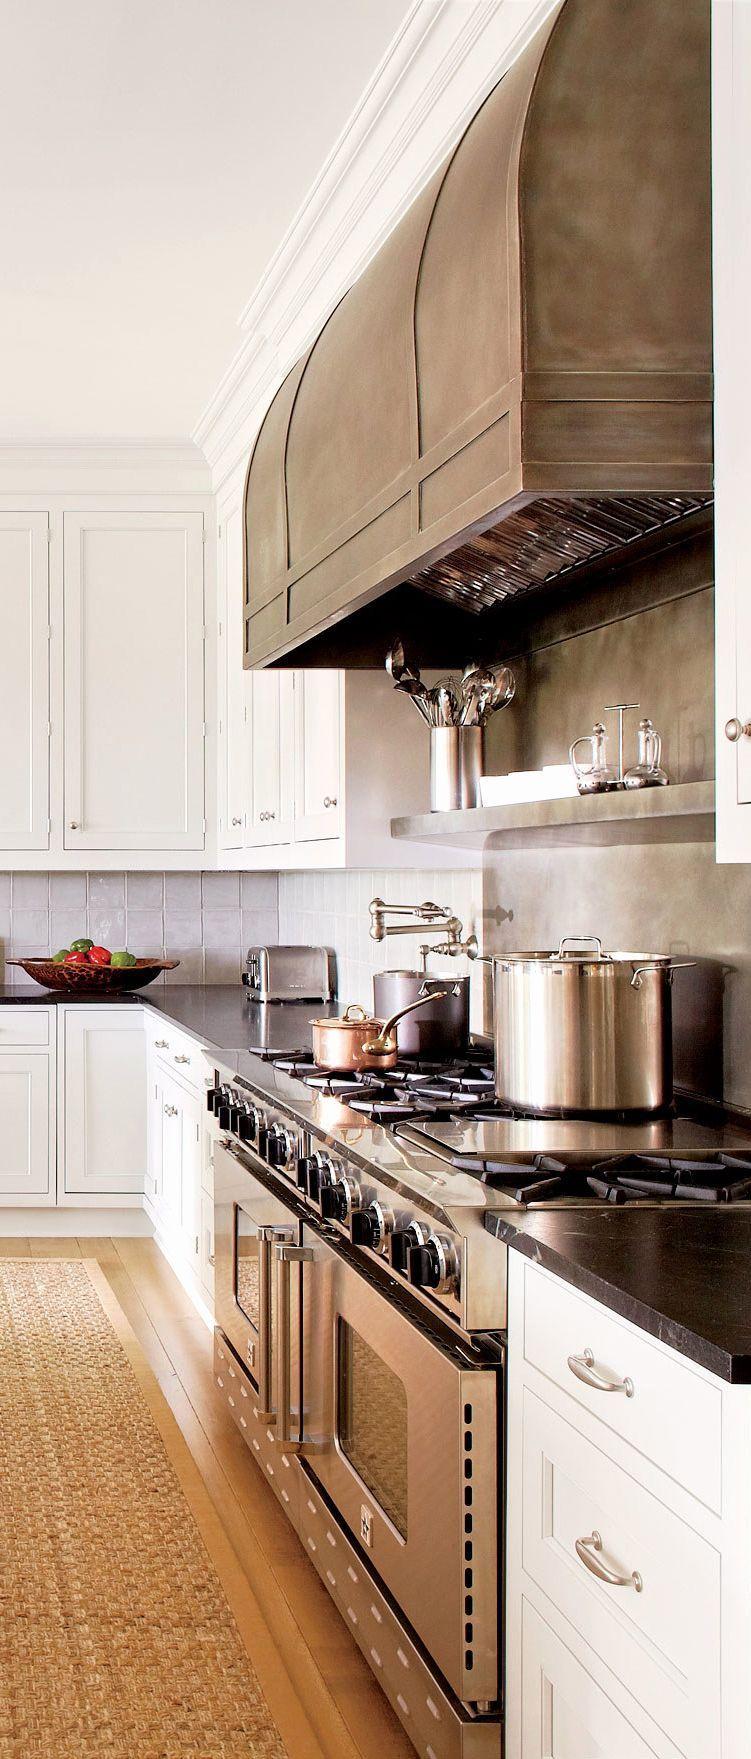 Build Your Own Custom Kitchen Appliances Bluestar Custom Kitchen Appliances Kitchen Design Decor Wood Floor Kitchen